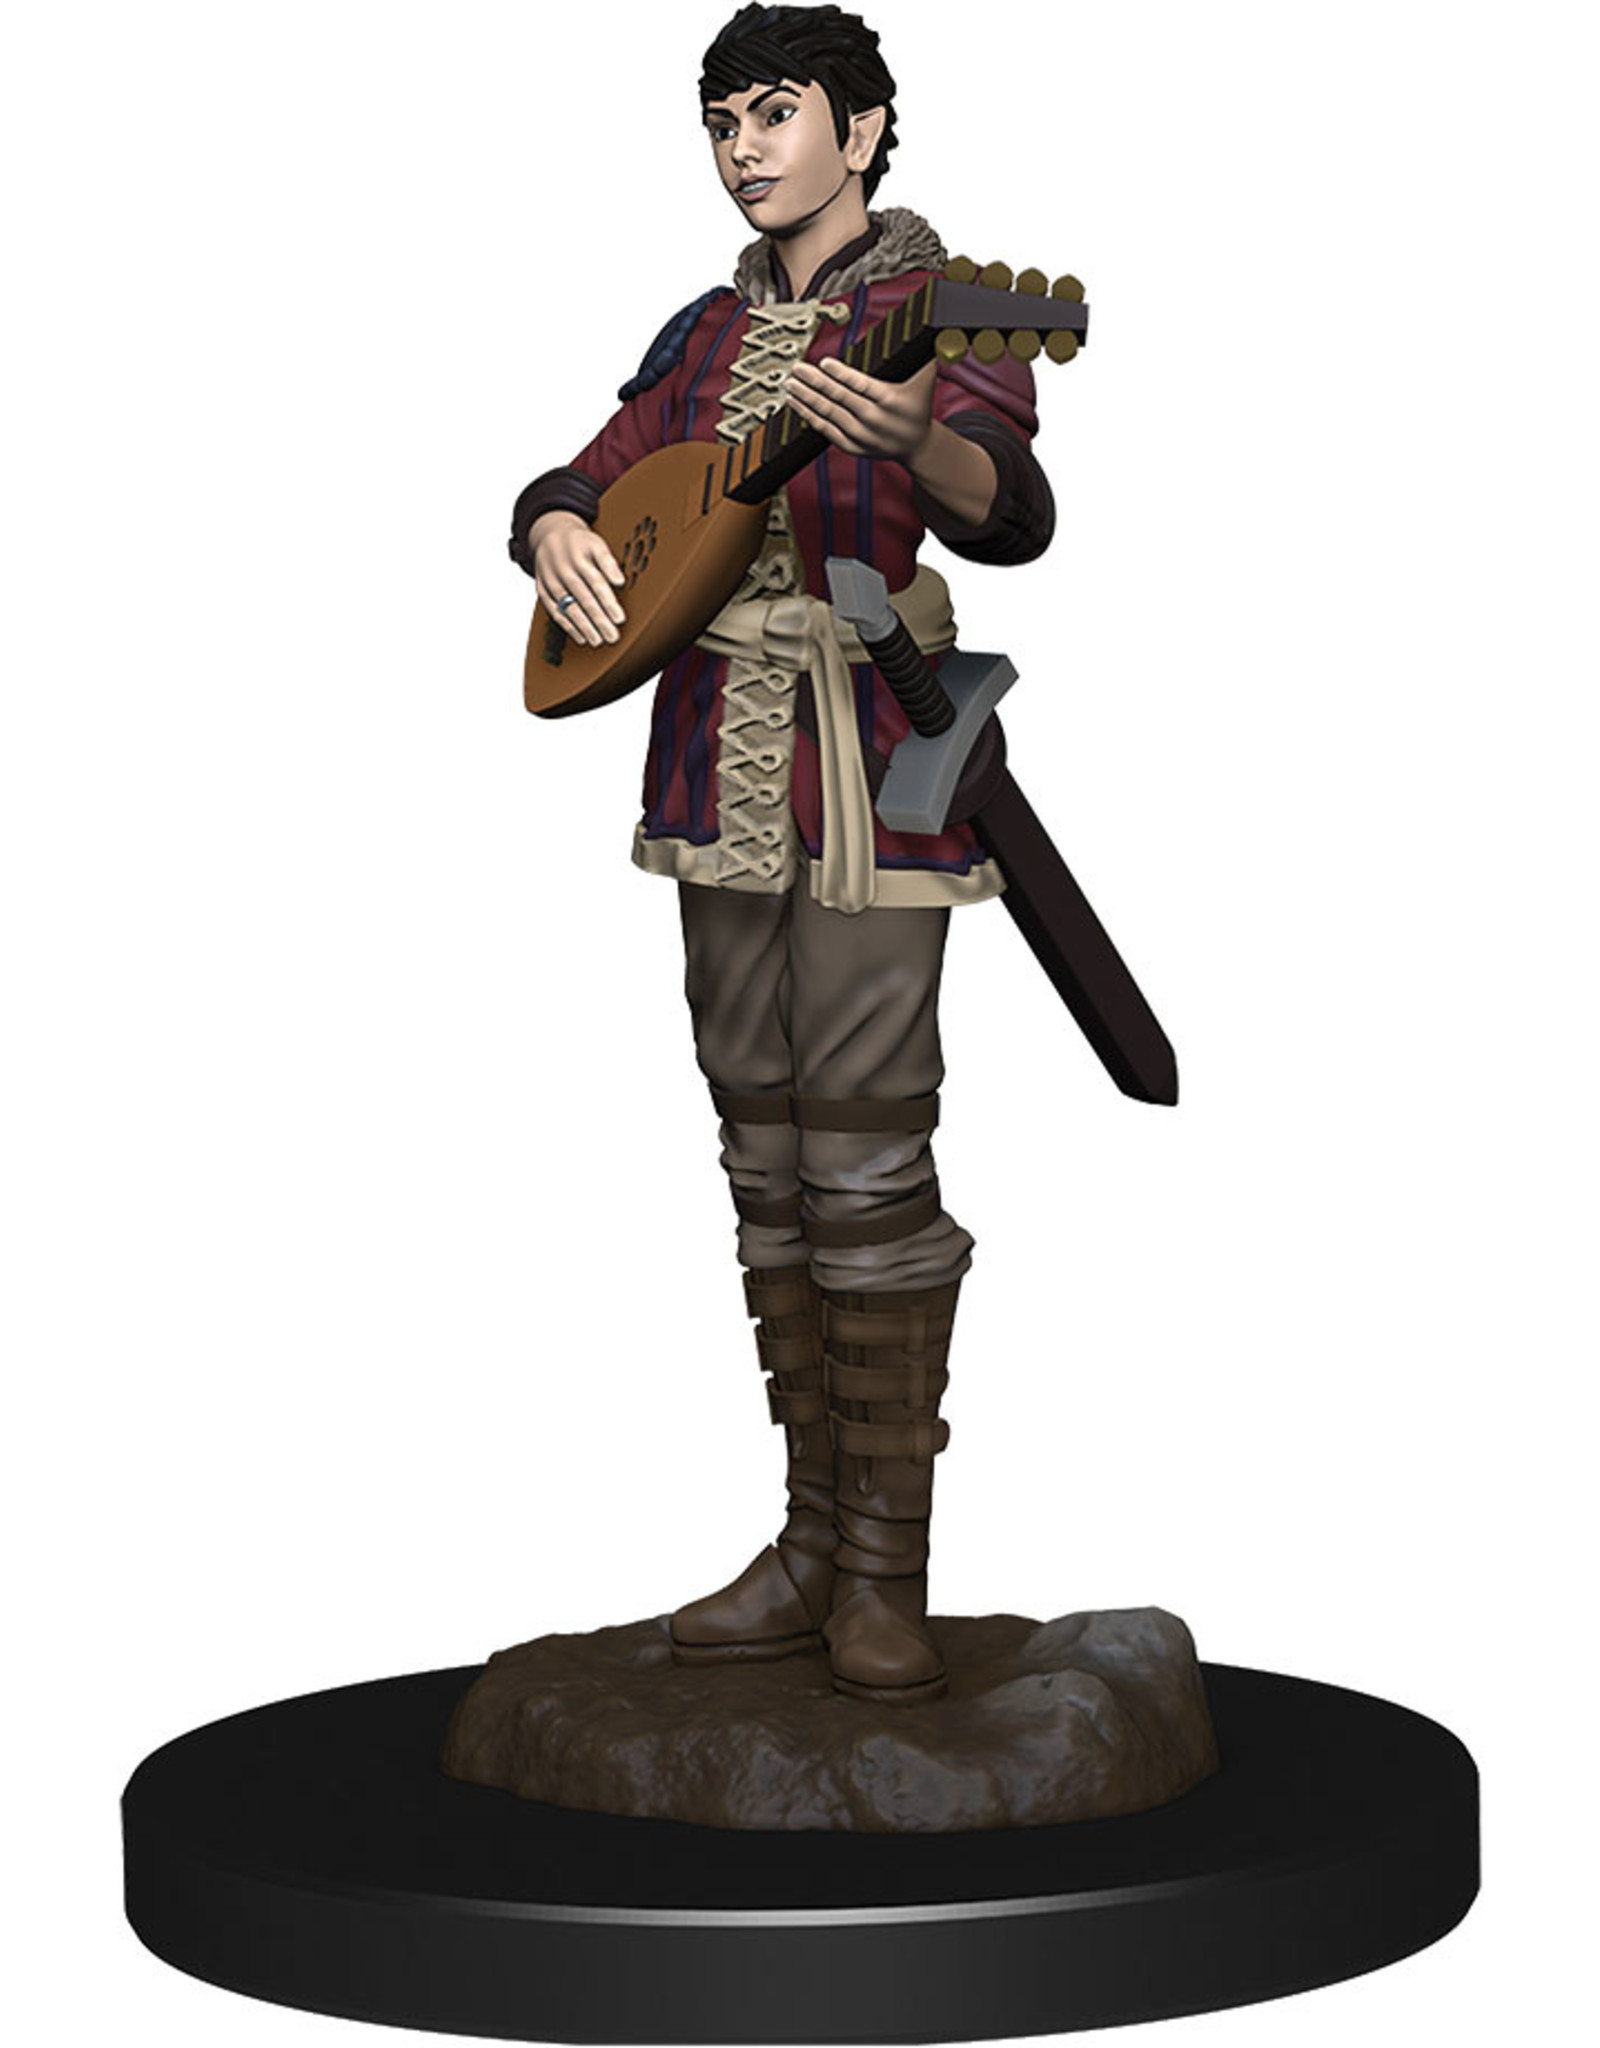 WizKids Dungeons & Dragons Fantasy Miniatures: Icons of the Realms Premium Figures W4 Half-Elf Bard Female